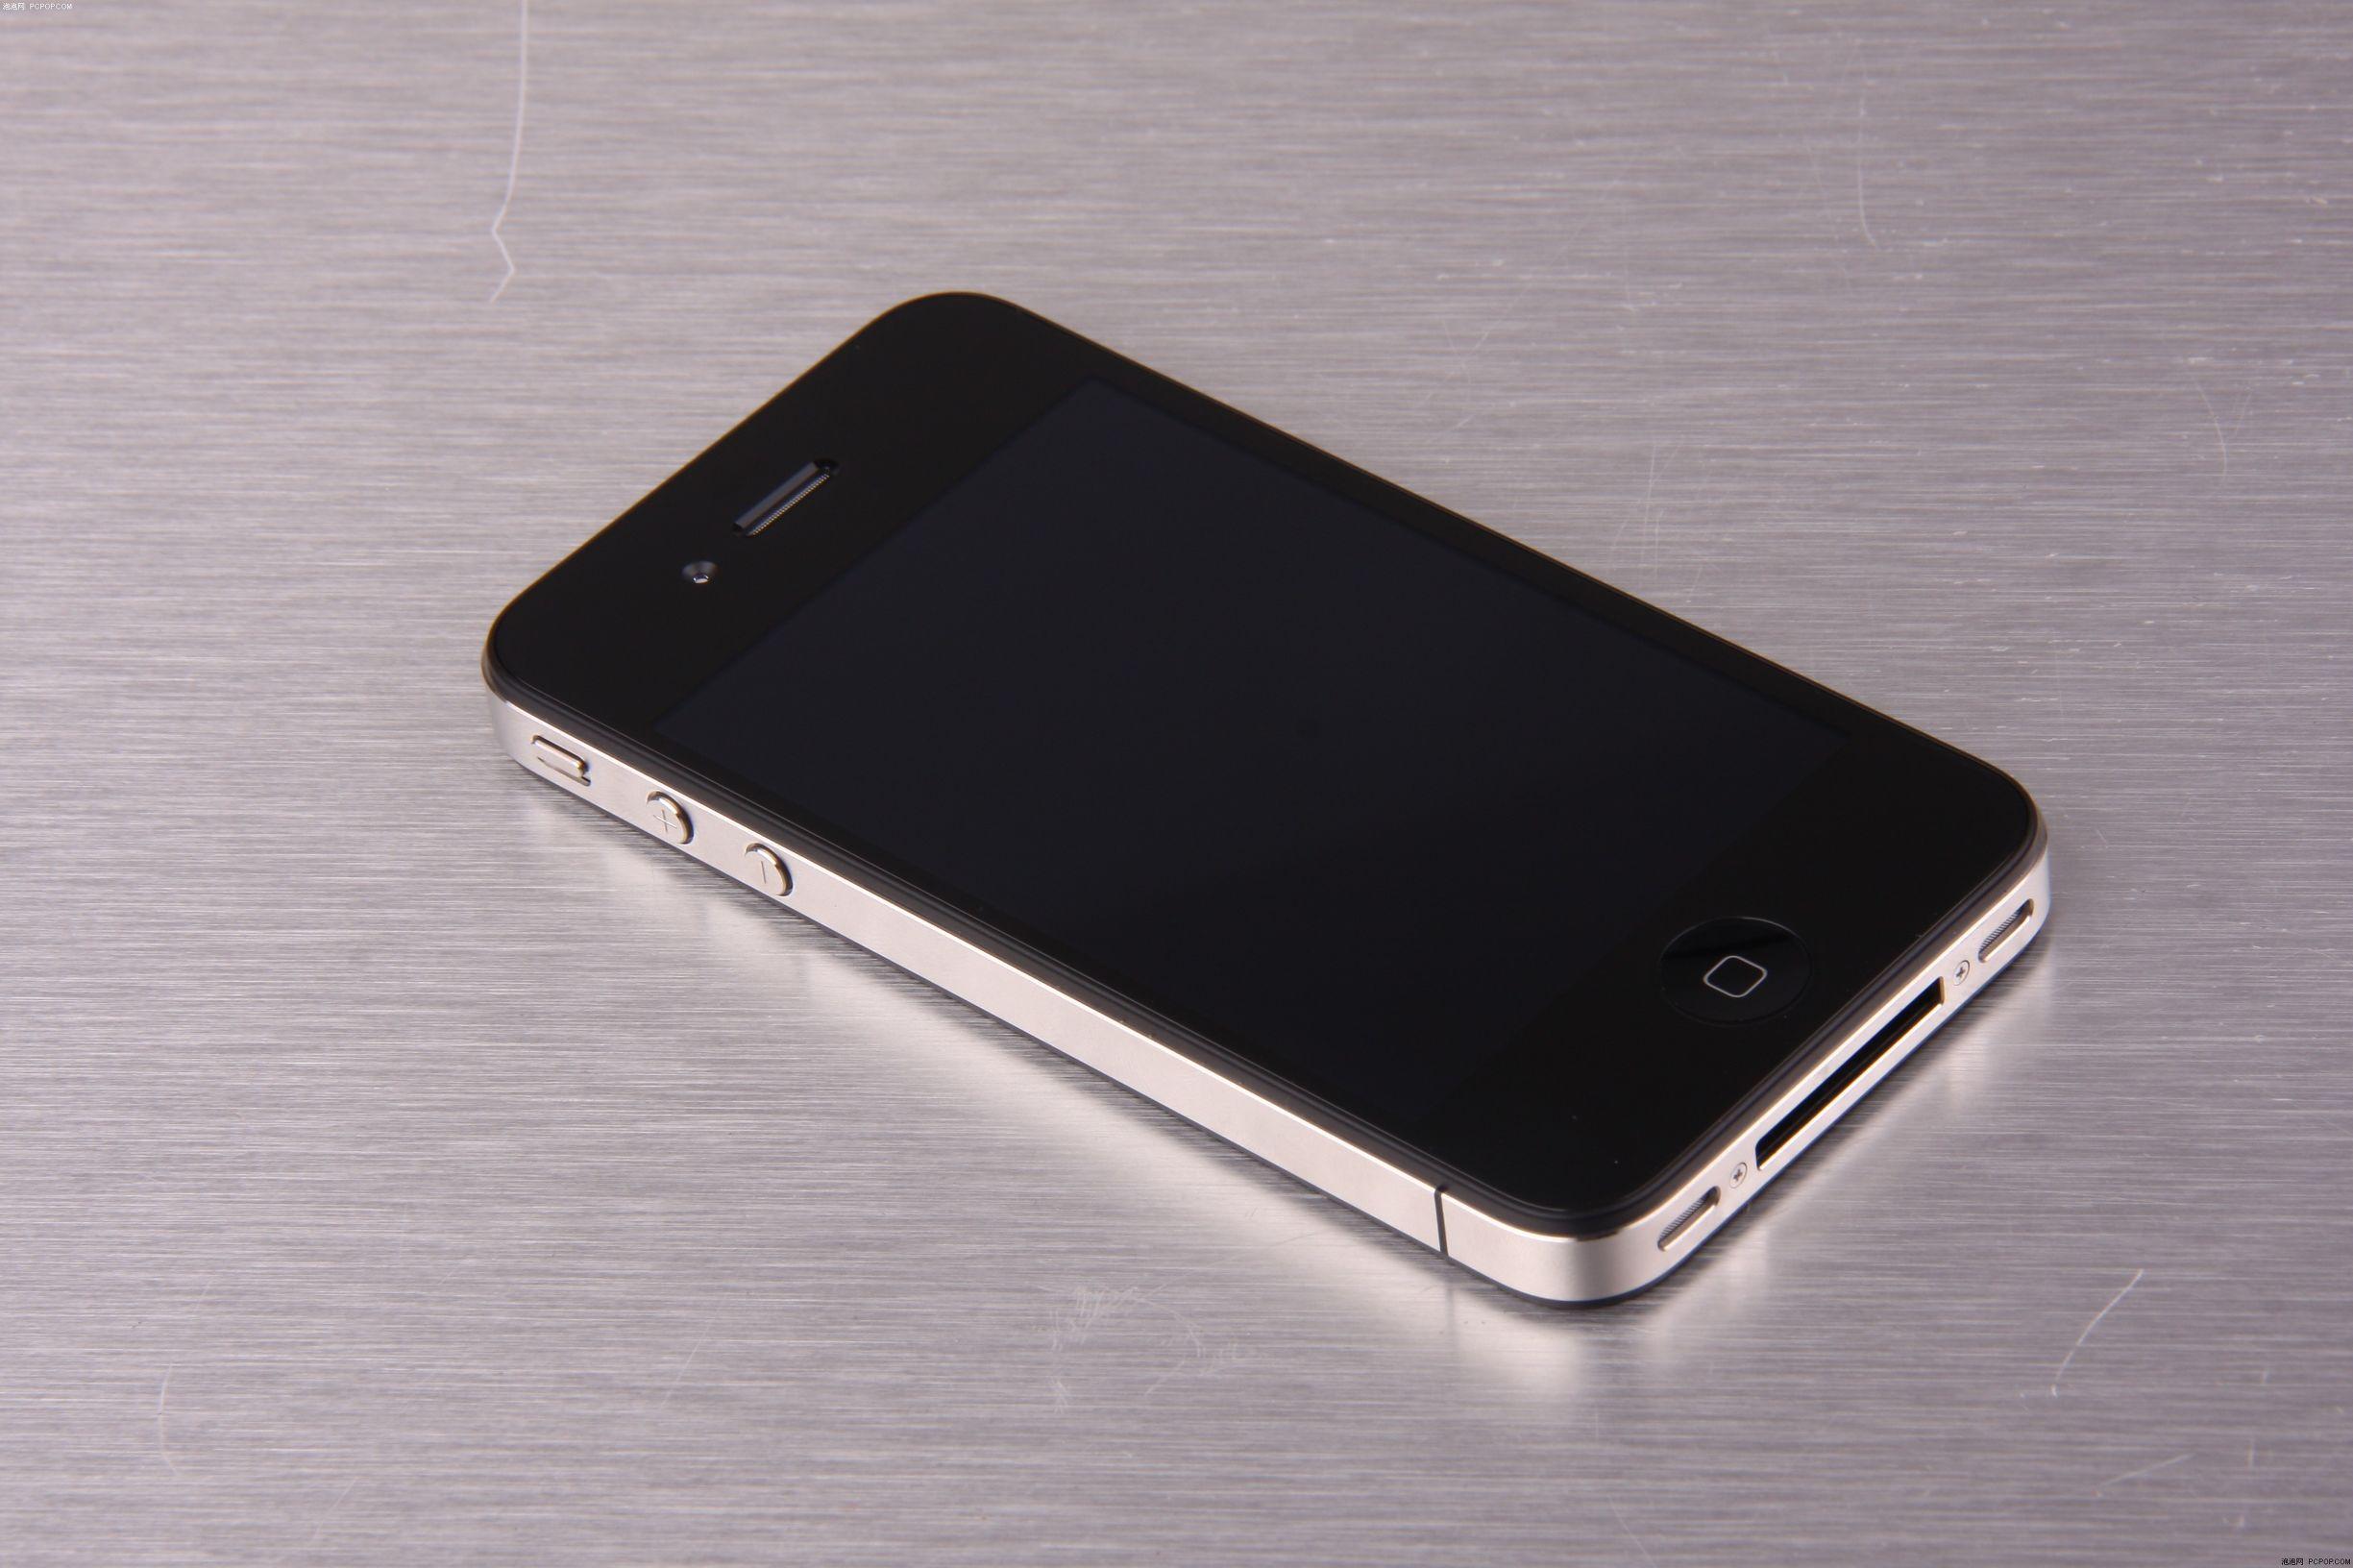 iPhone 4:说起再见吧!